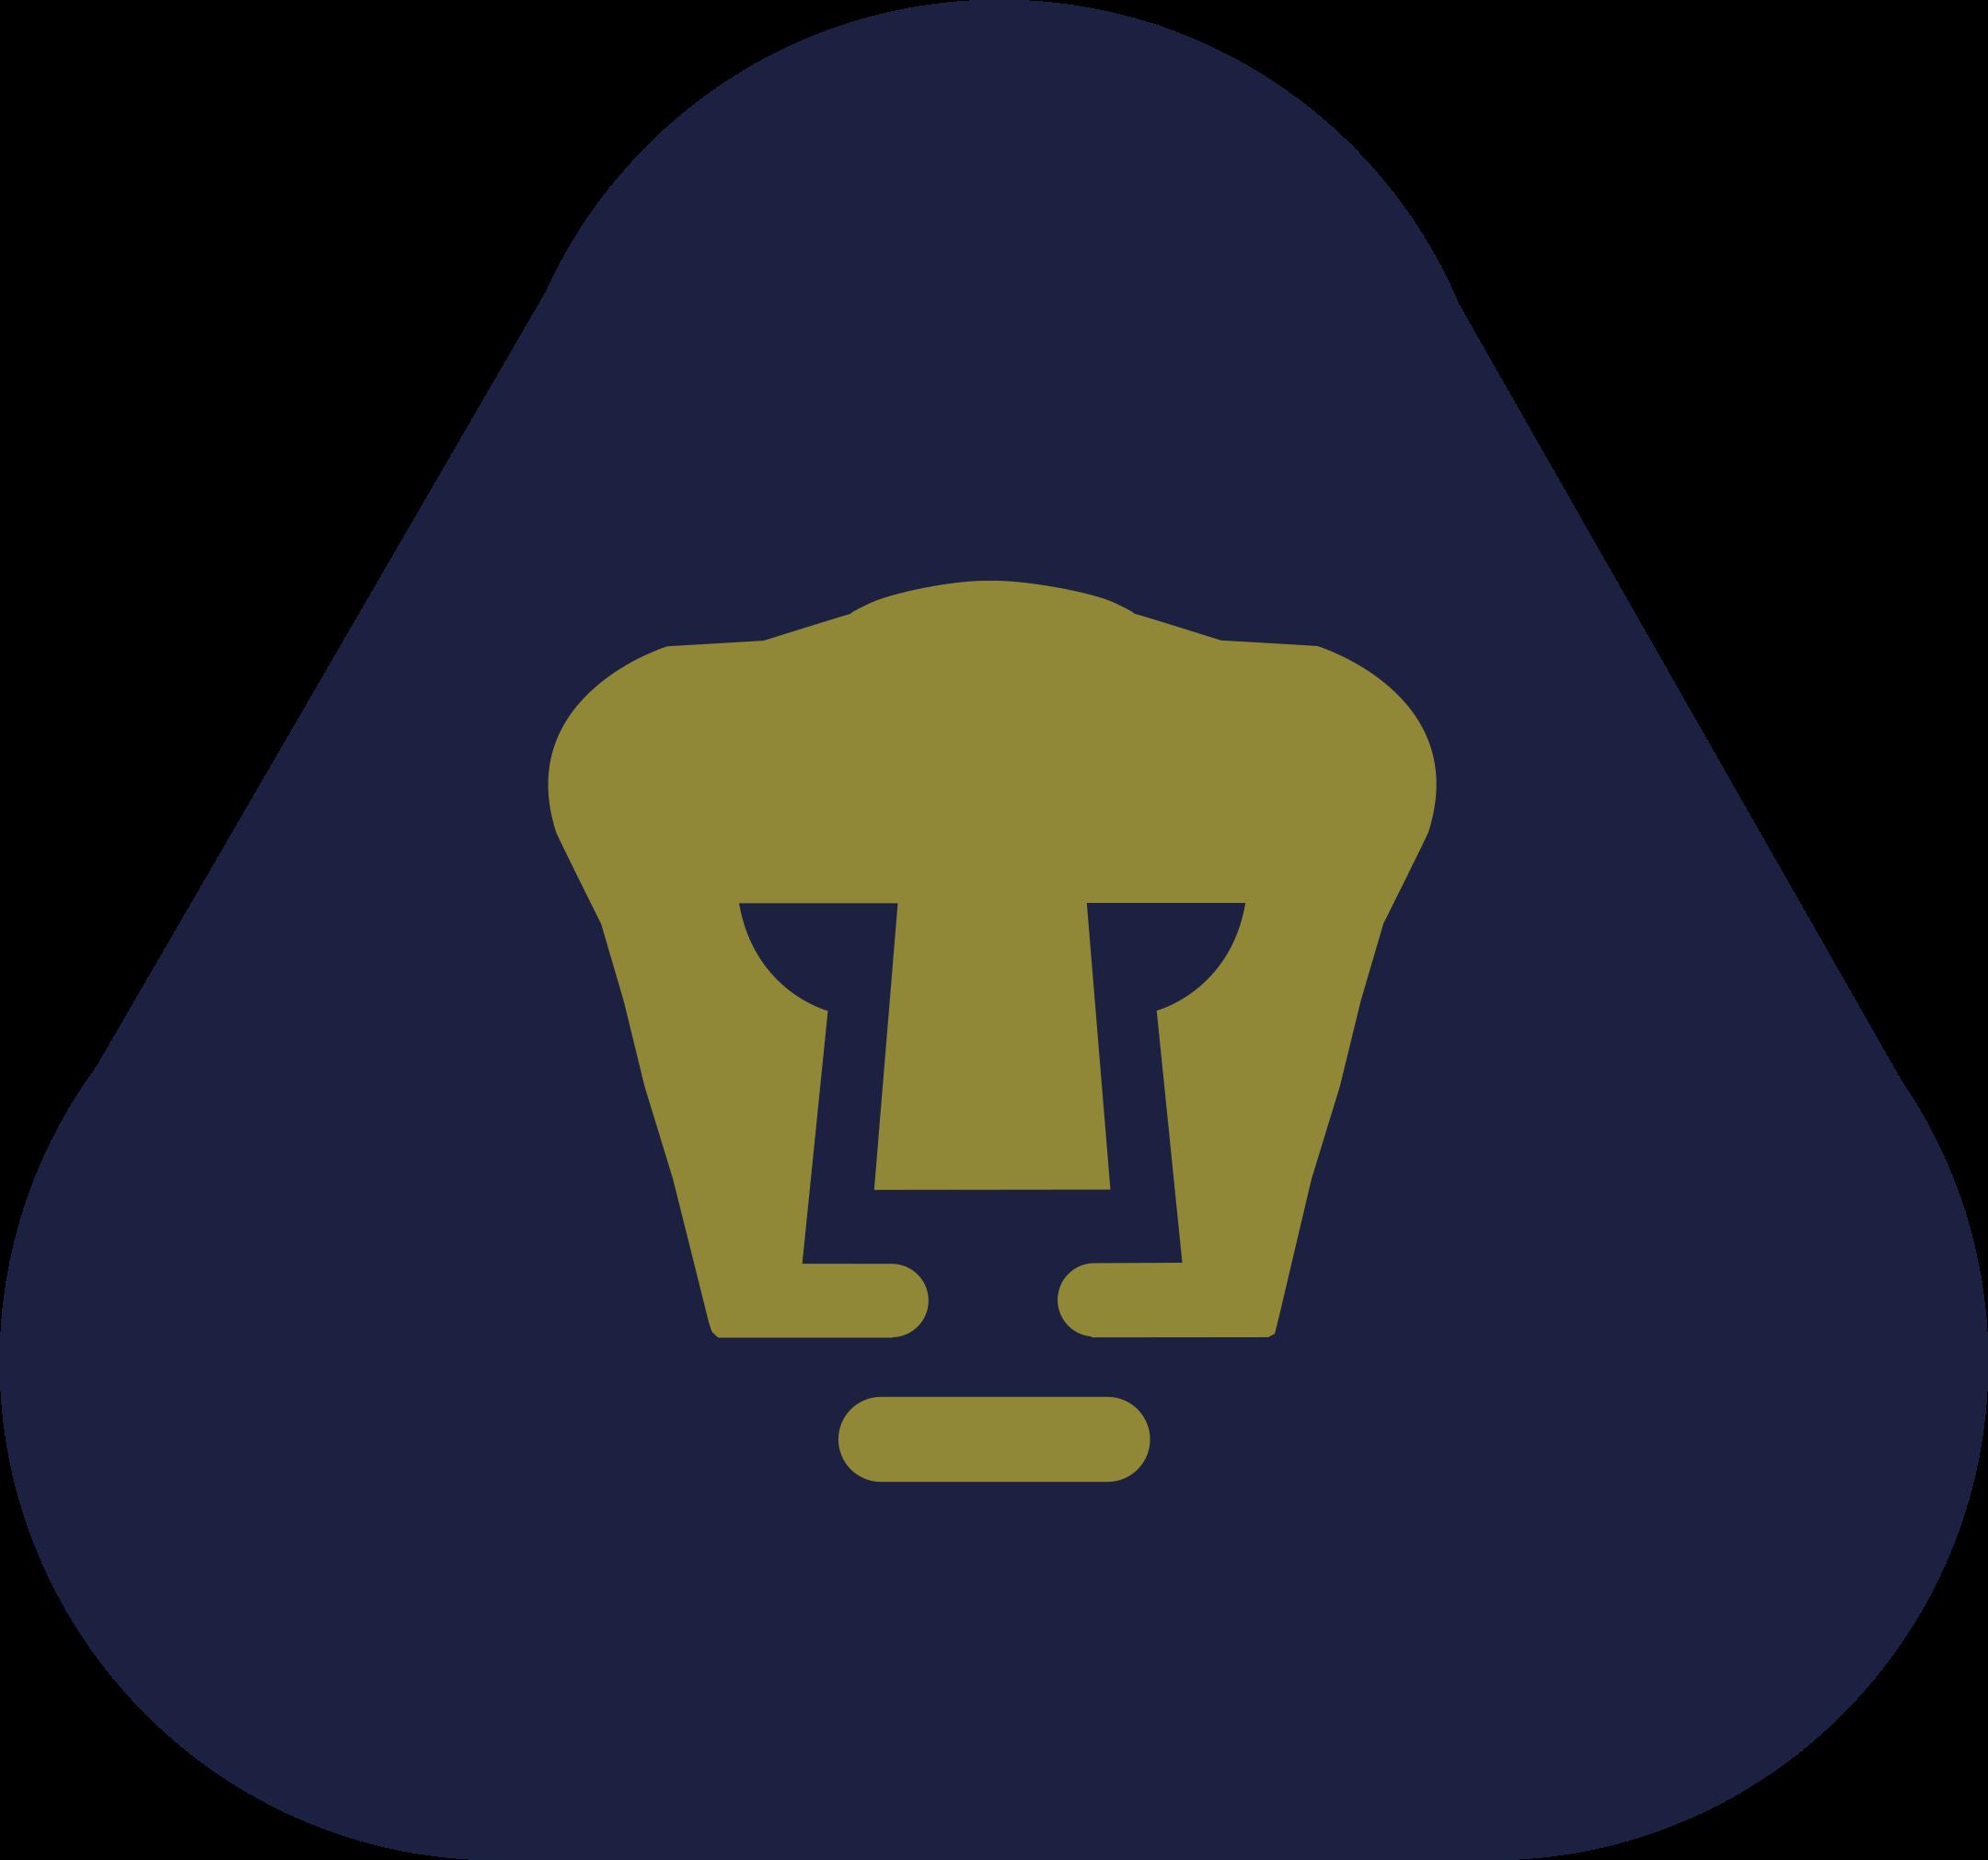 pumas unam logo 1 - Pumas UNAM Logo - Escudo